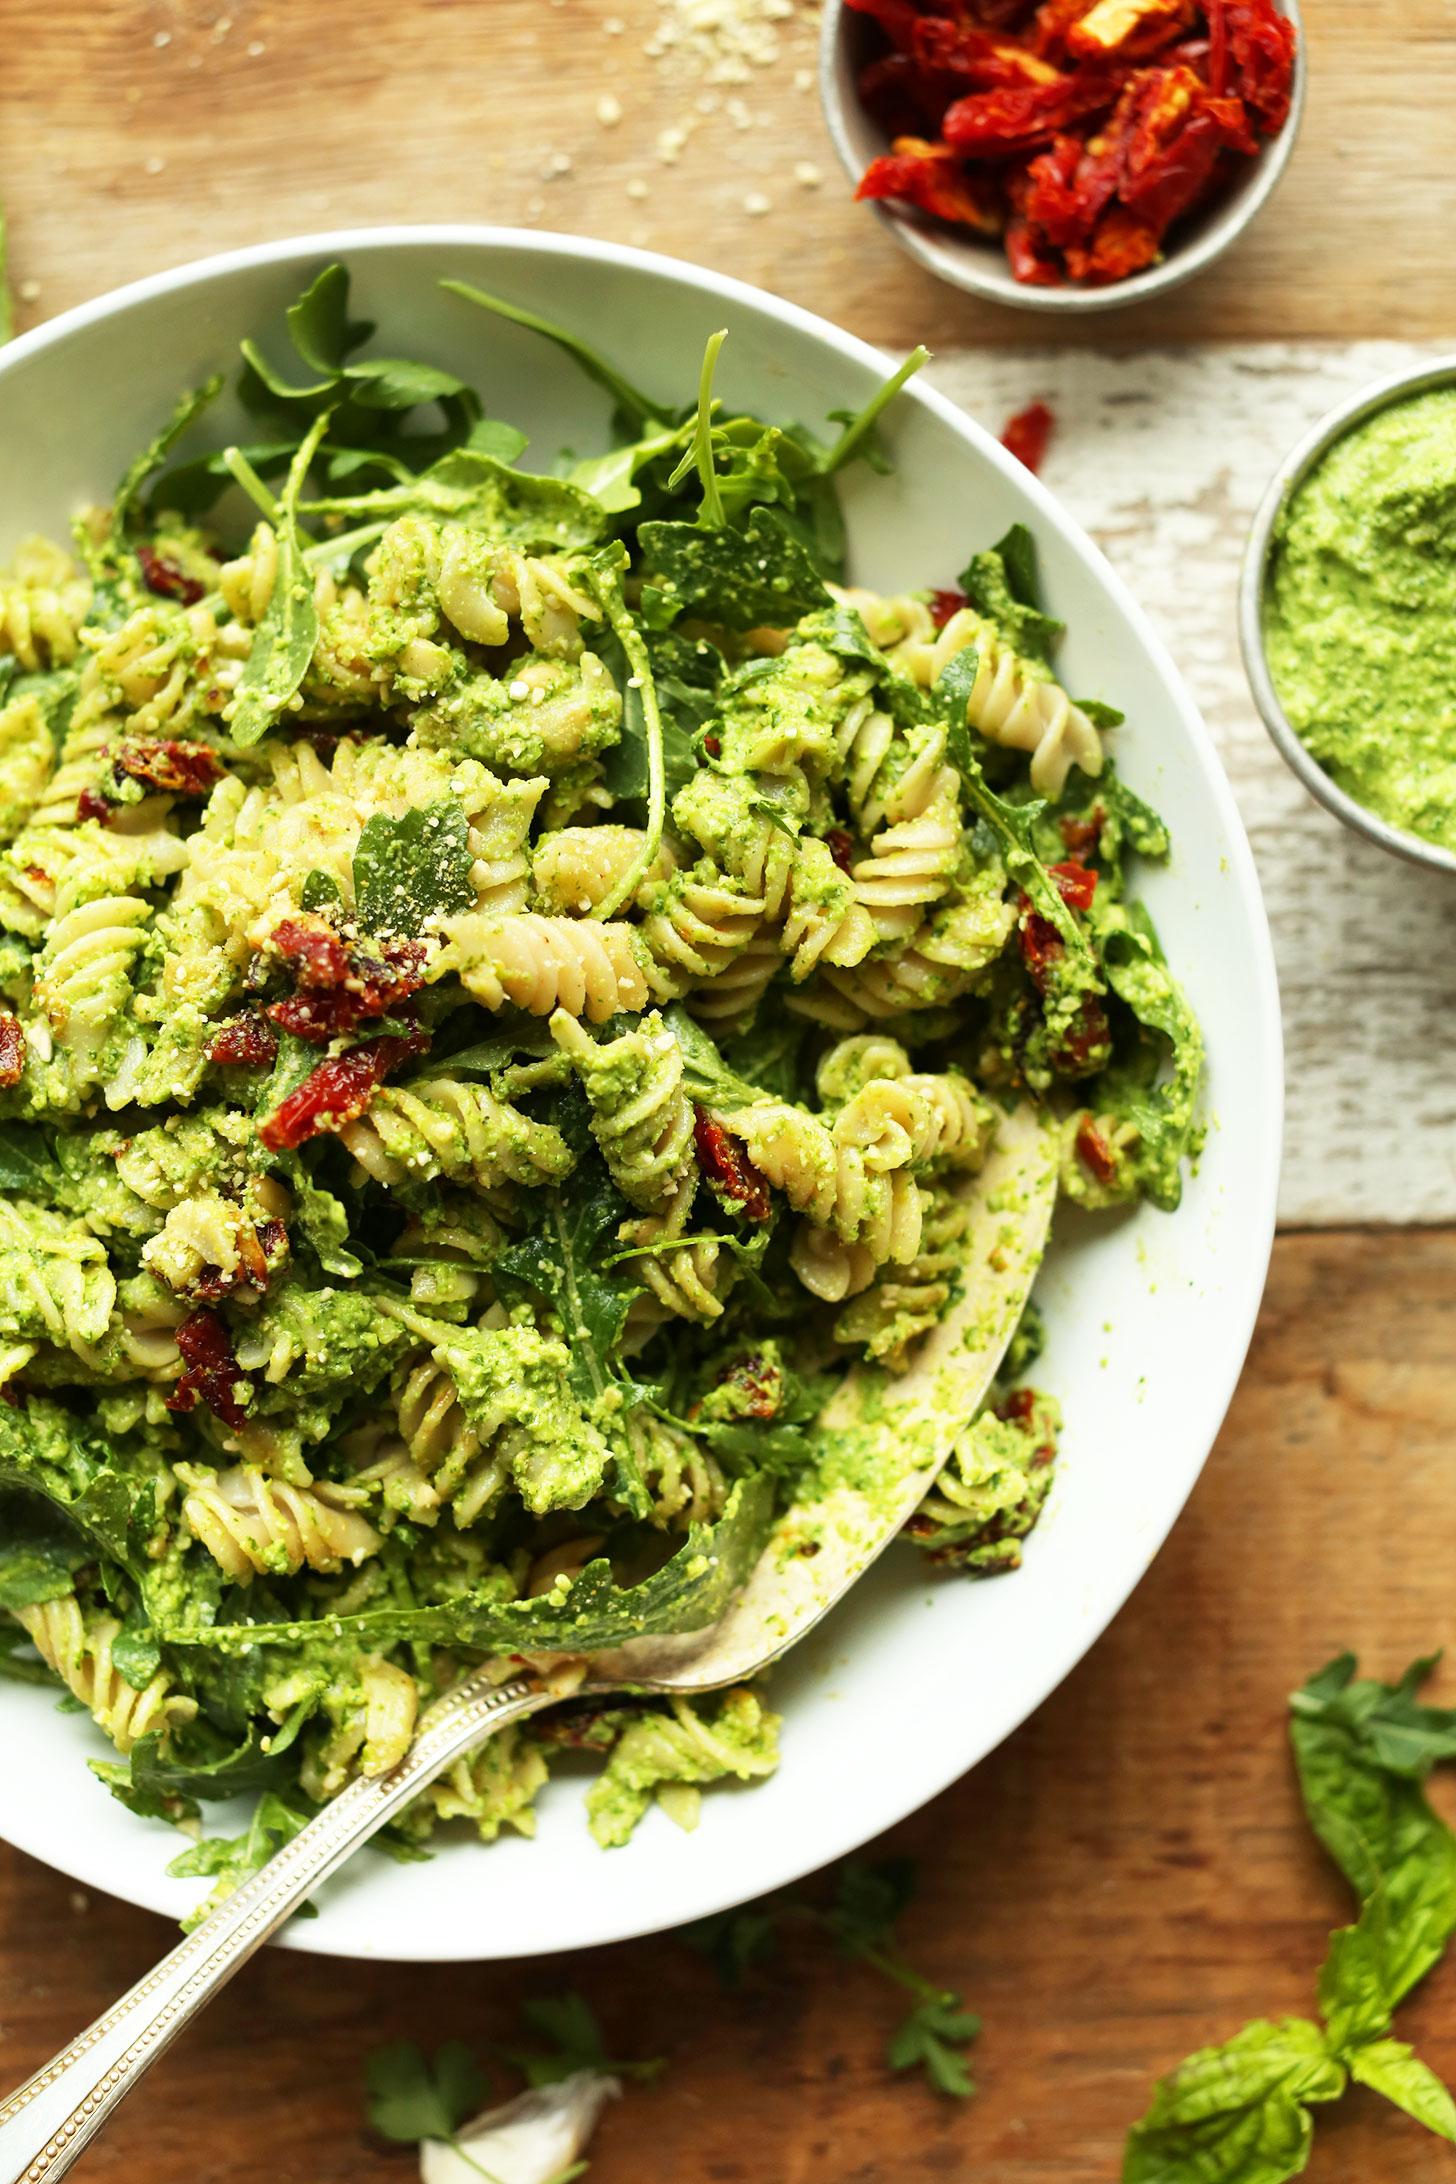 Big bowl of Pea Pesto Pasta for a gluten-free vegan comfort food meal